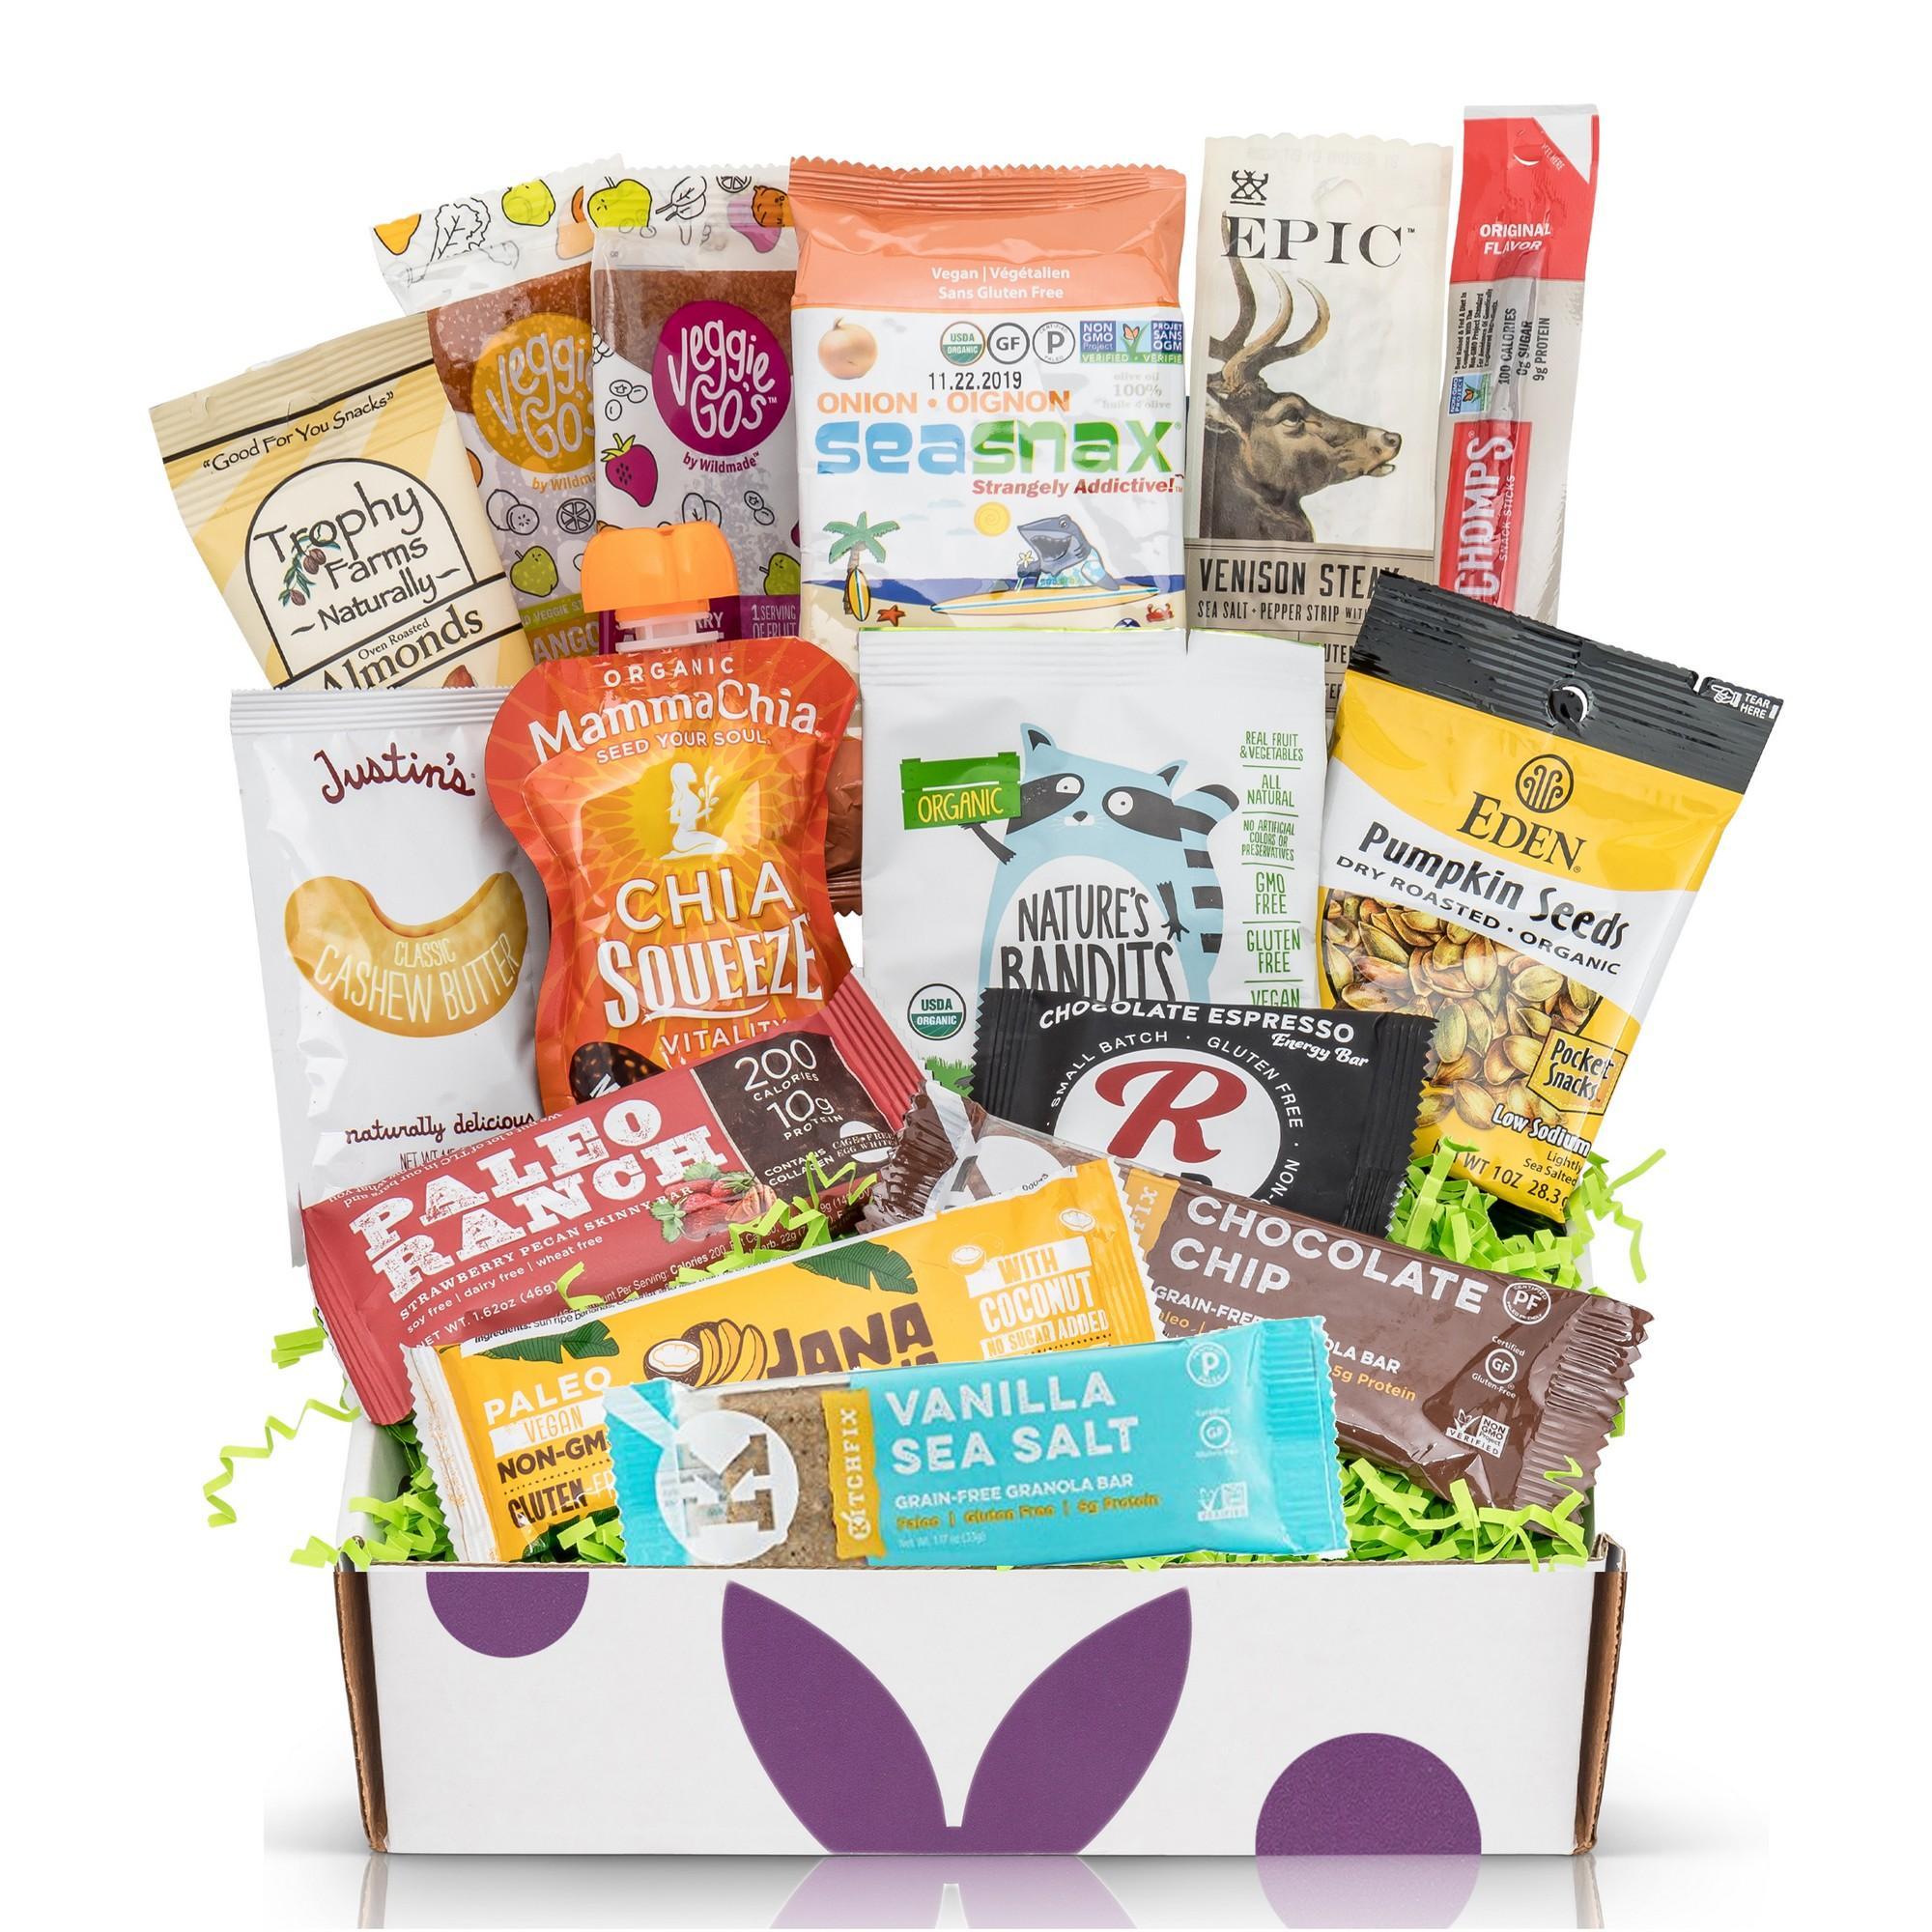 Bunny James Box - Hand Selected Premium Snacks Subscription: Paleo